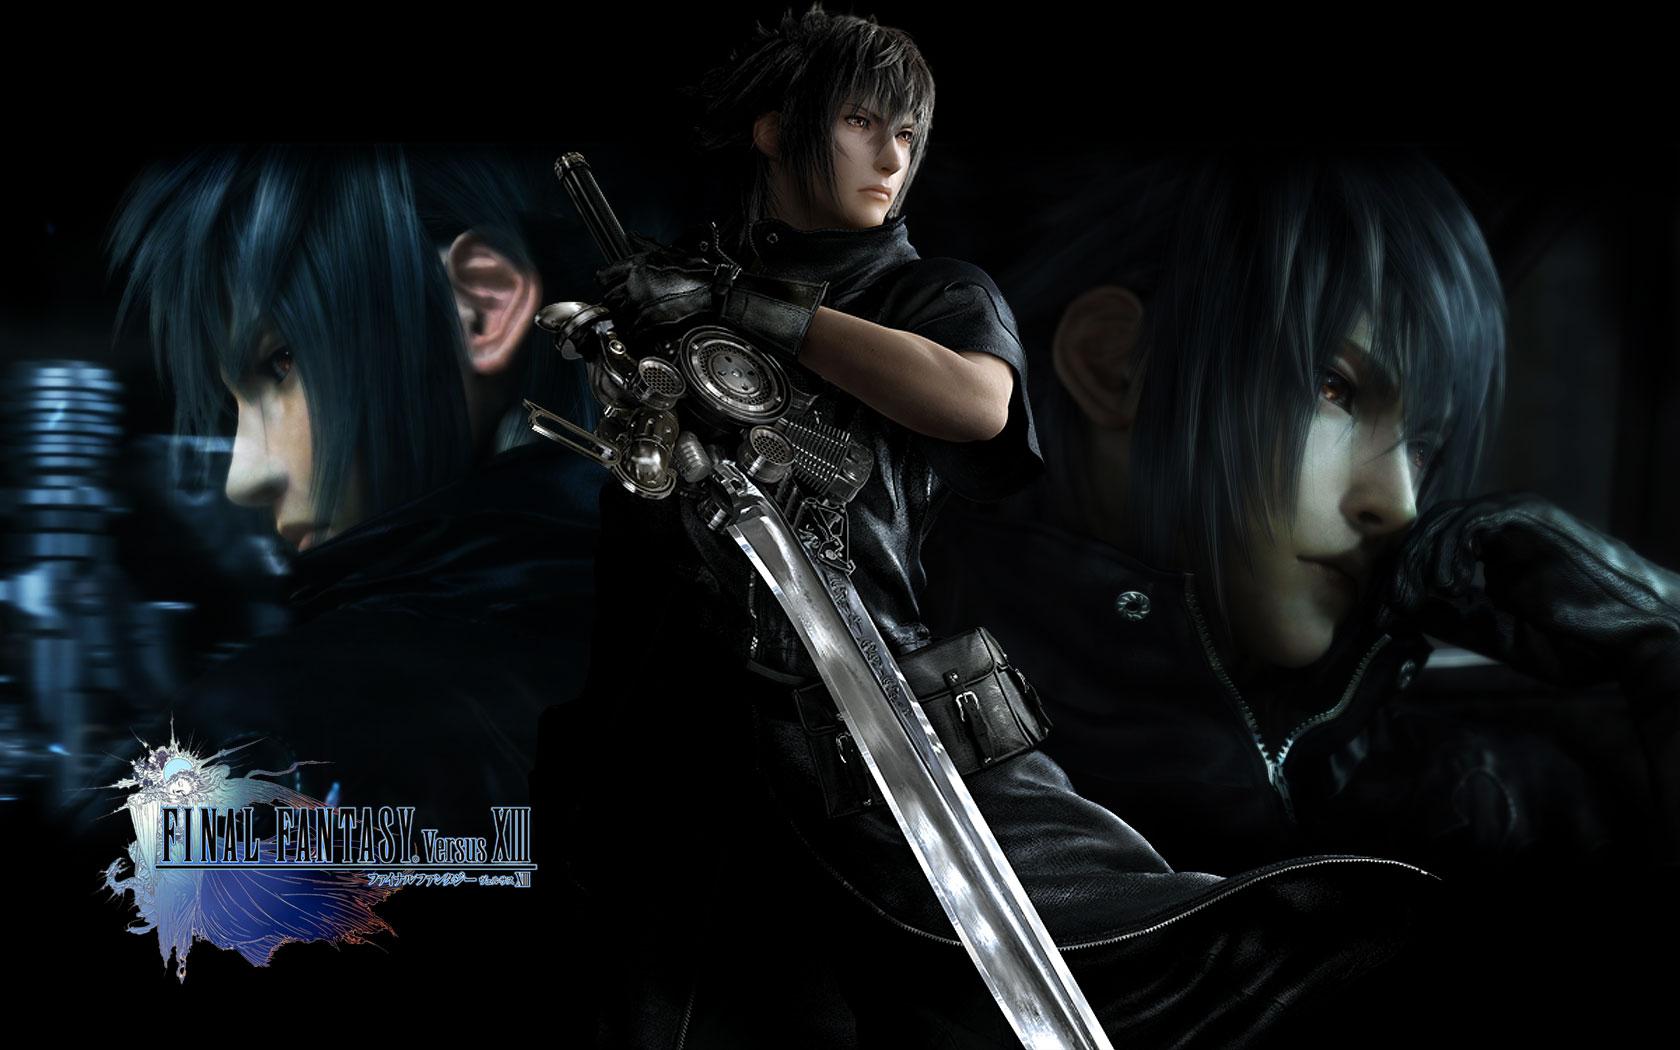 4k Noctis Lucis Caelum Final Fantasy Xv Hd Games 4k: Final Fantasy XIII Wallpaper: Noctis